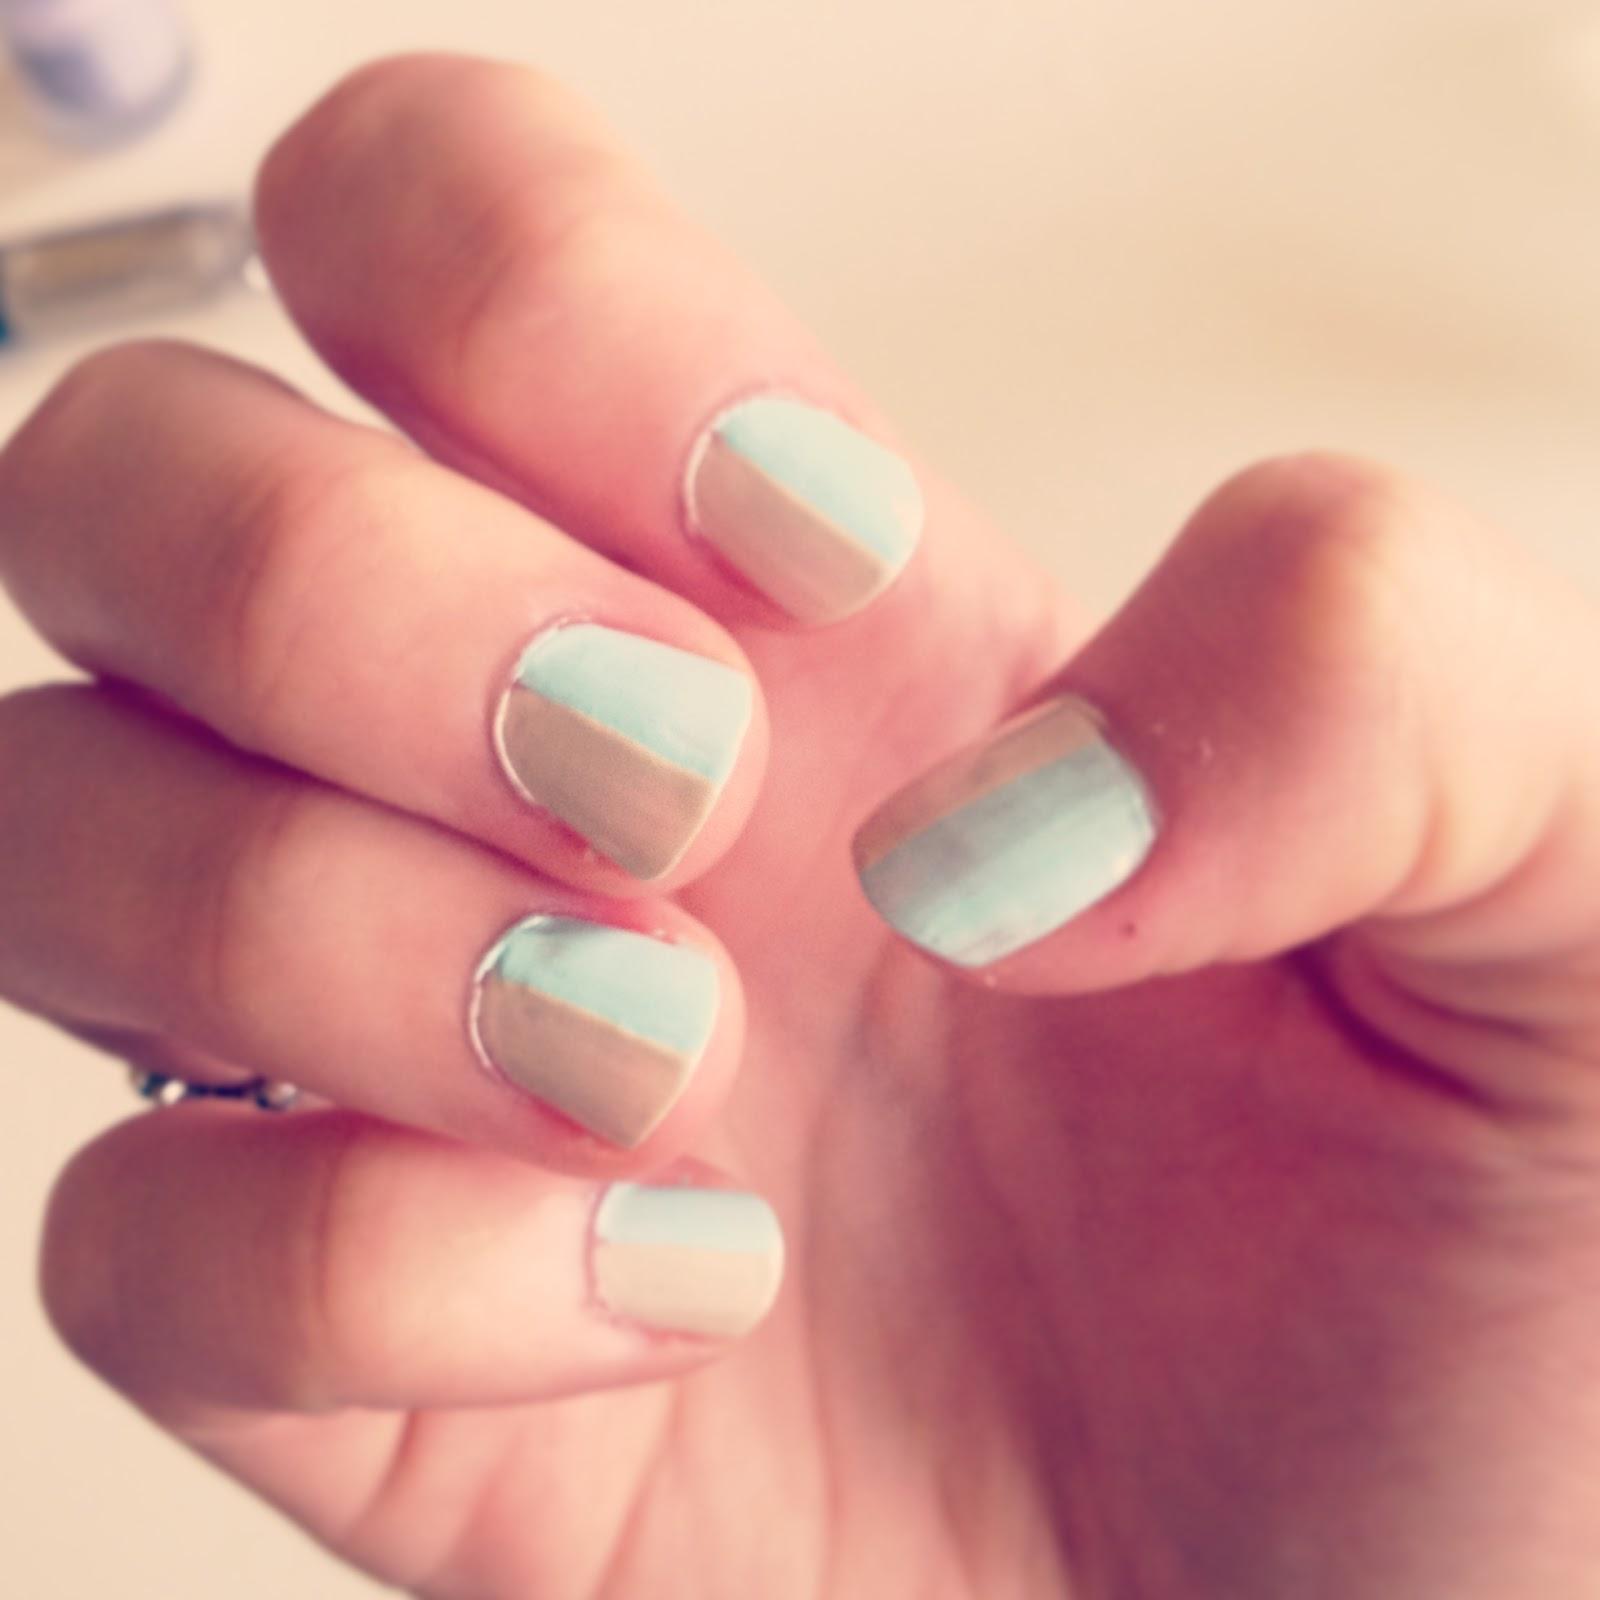 Mint and nude nail varnish